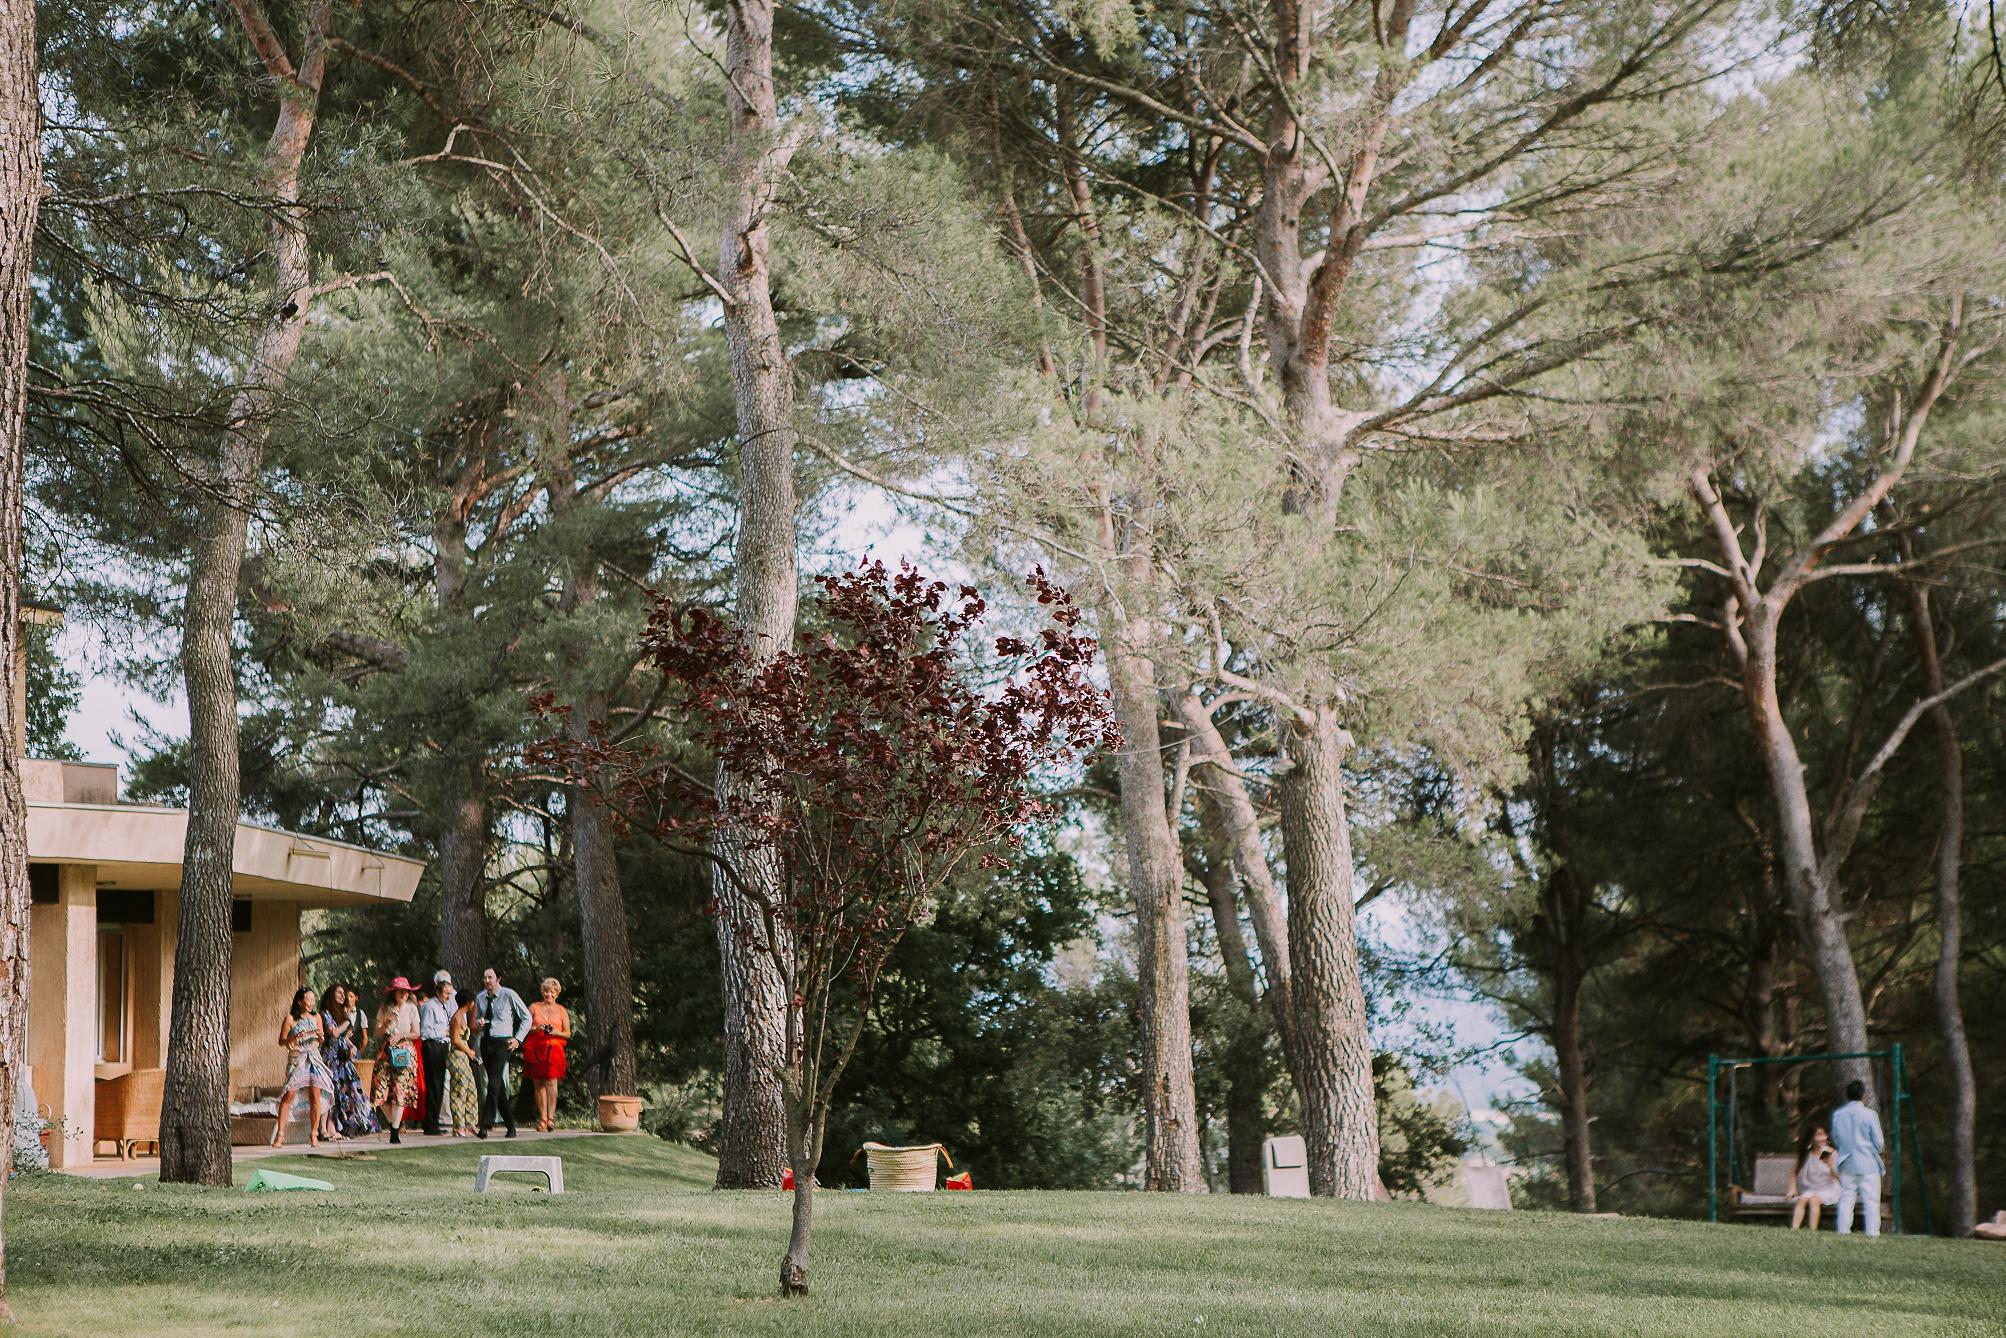 katerynaphotos-mariage-photographe-puyloubier-provence-aix-en-provence-sud-de-la-france_0408.jpg